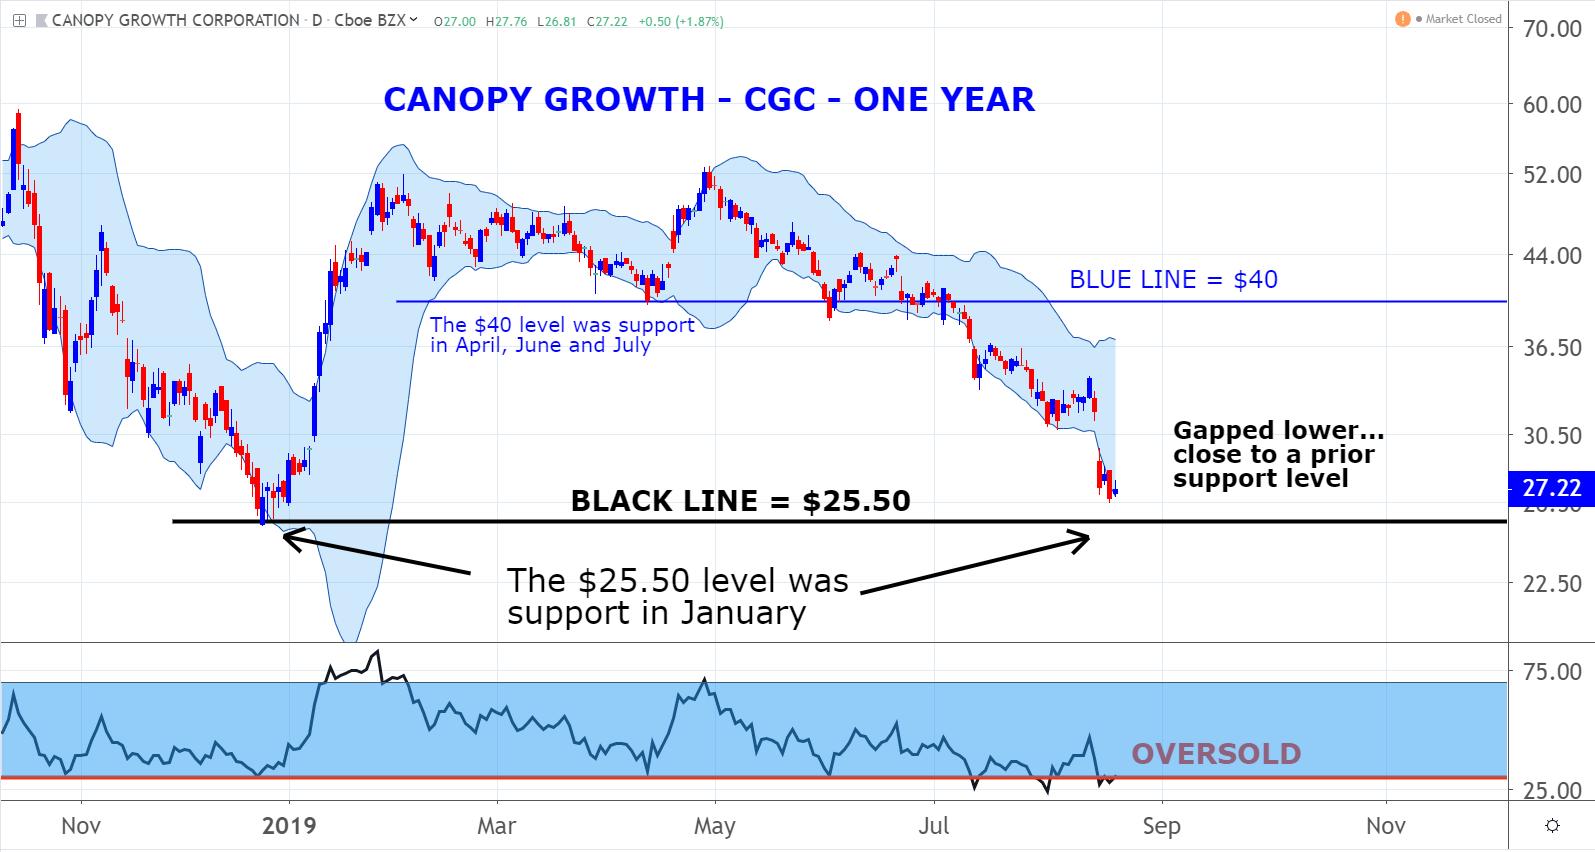 Marijuana Stocks to Watch: Canopy Growth (CGC)